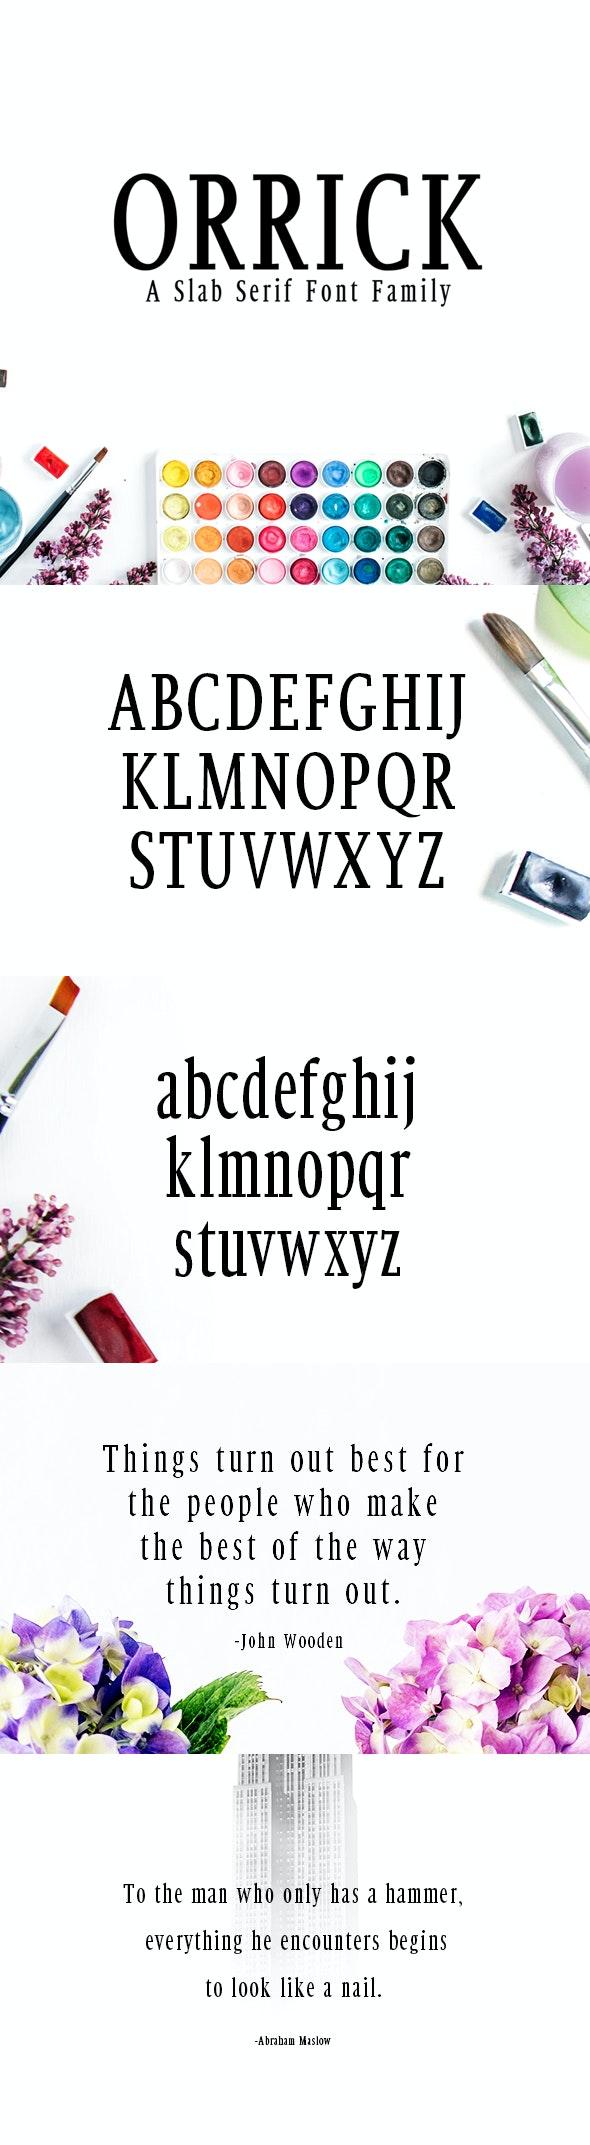 Orrick Slab Serif Font Family - Fonts